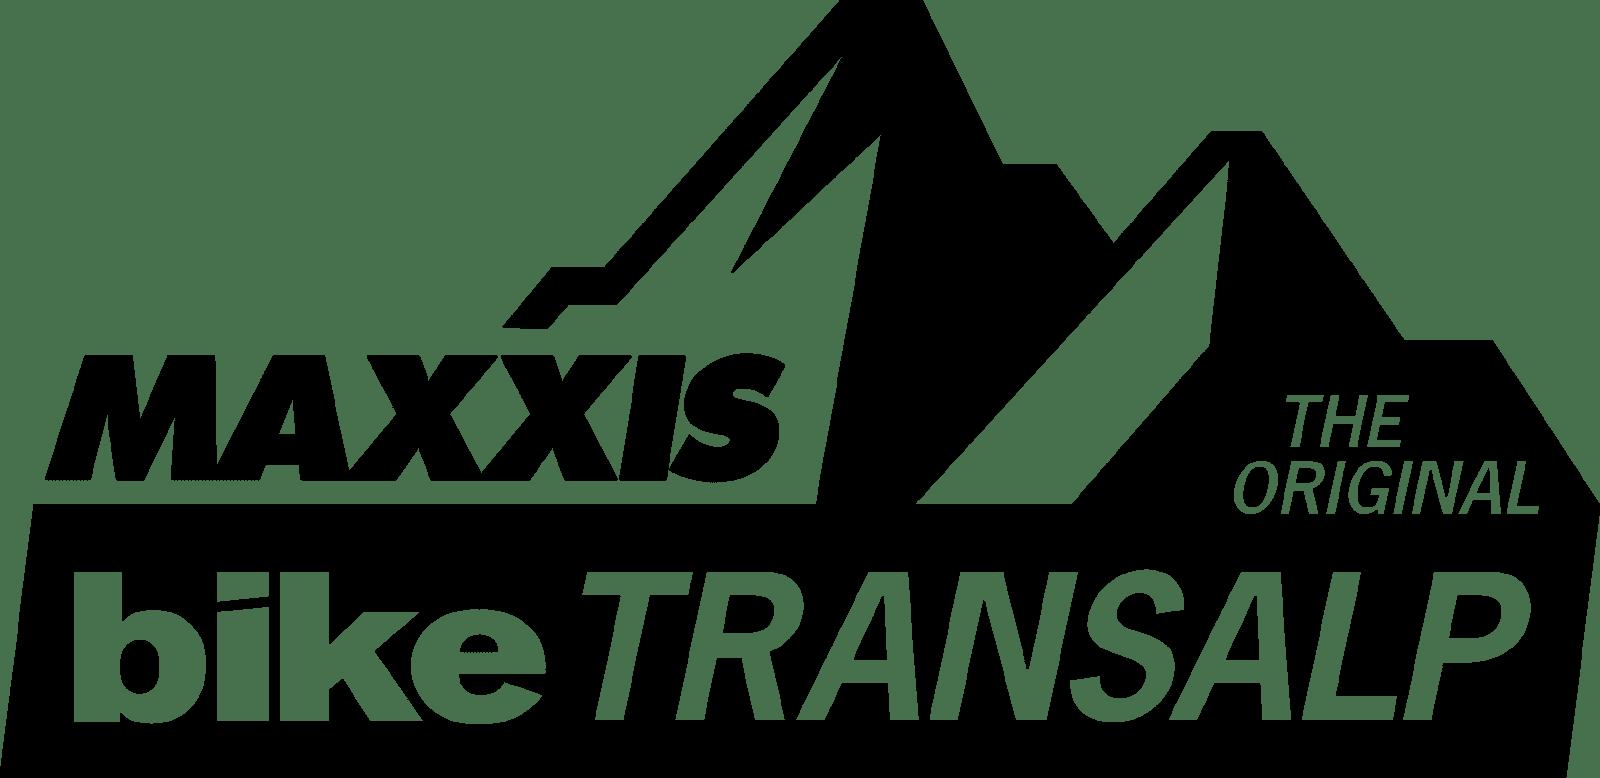 Maxxis Bike Transalp Logo